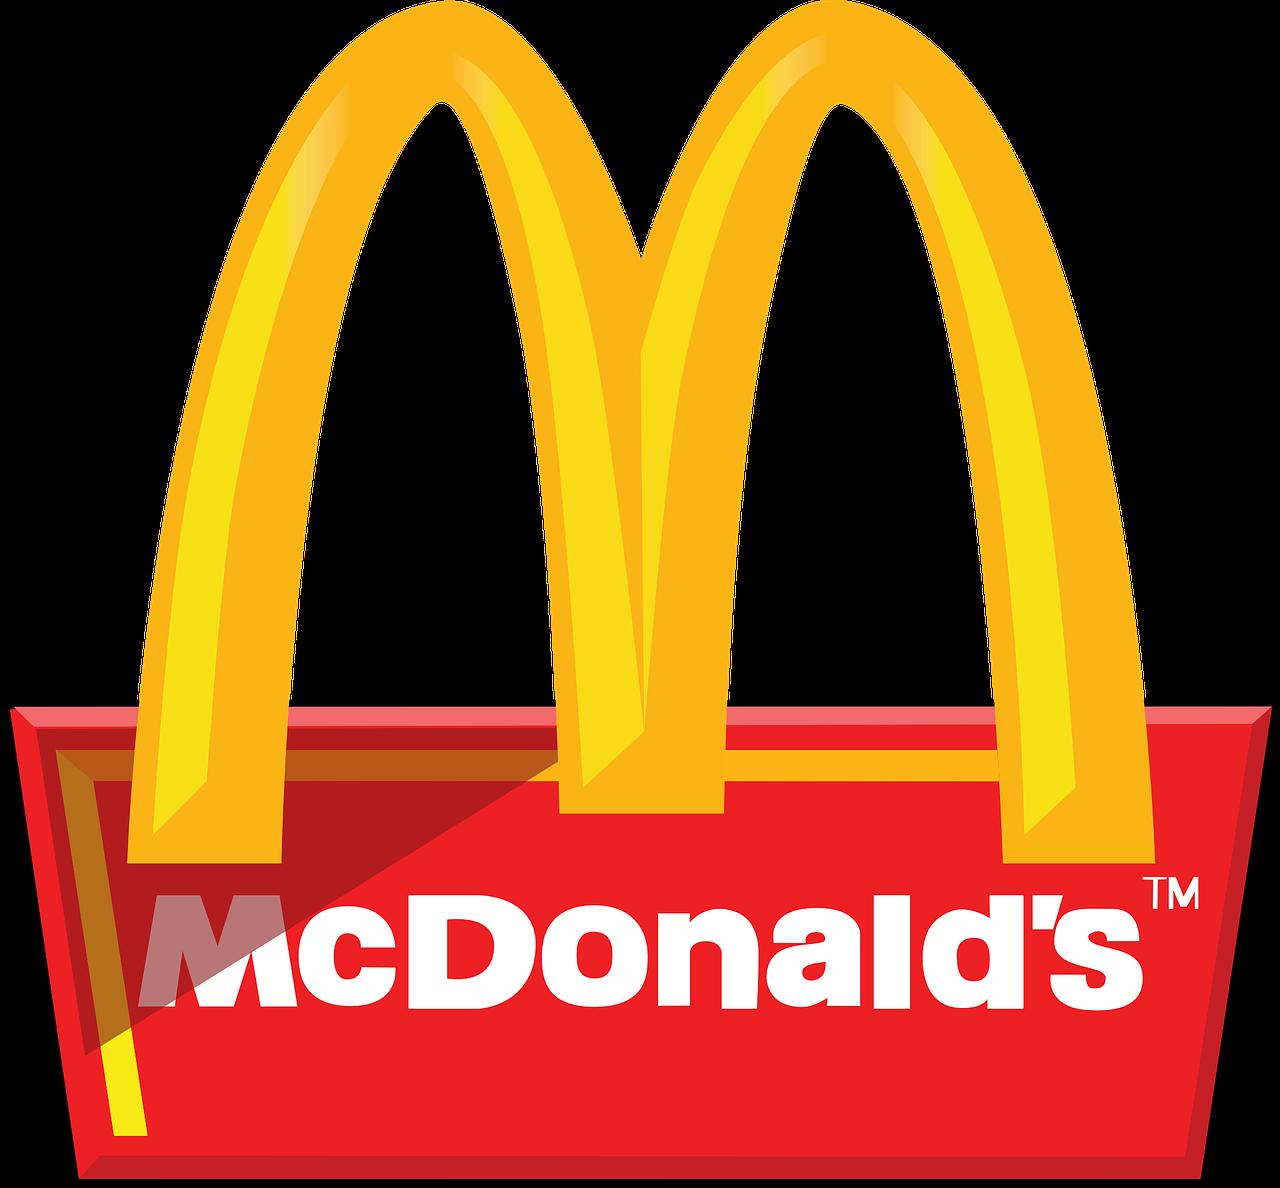 mcdonalds an american icon The big mac has become an american icon over its 50-year run in 2007, the big mac museum restaurant was established in north huntingdon, pennsylvania, to honor the juicy burger.